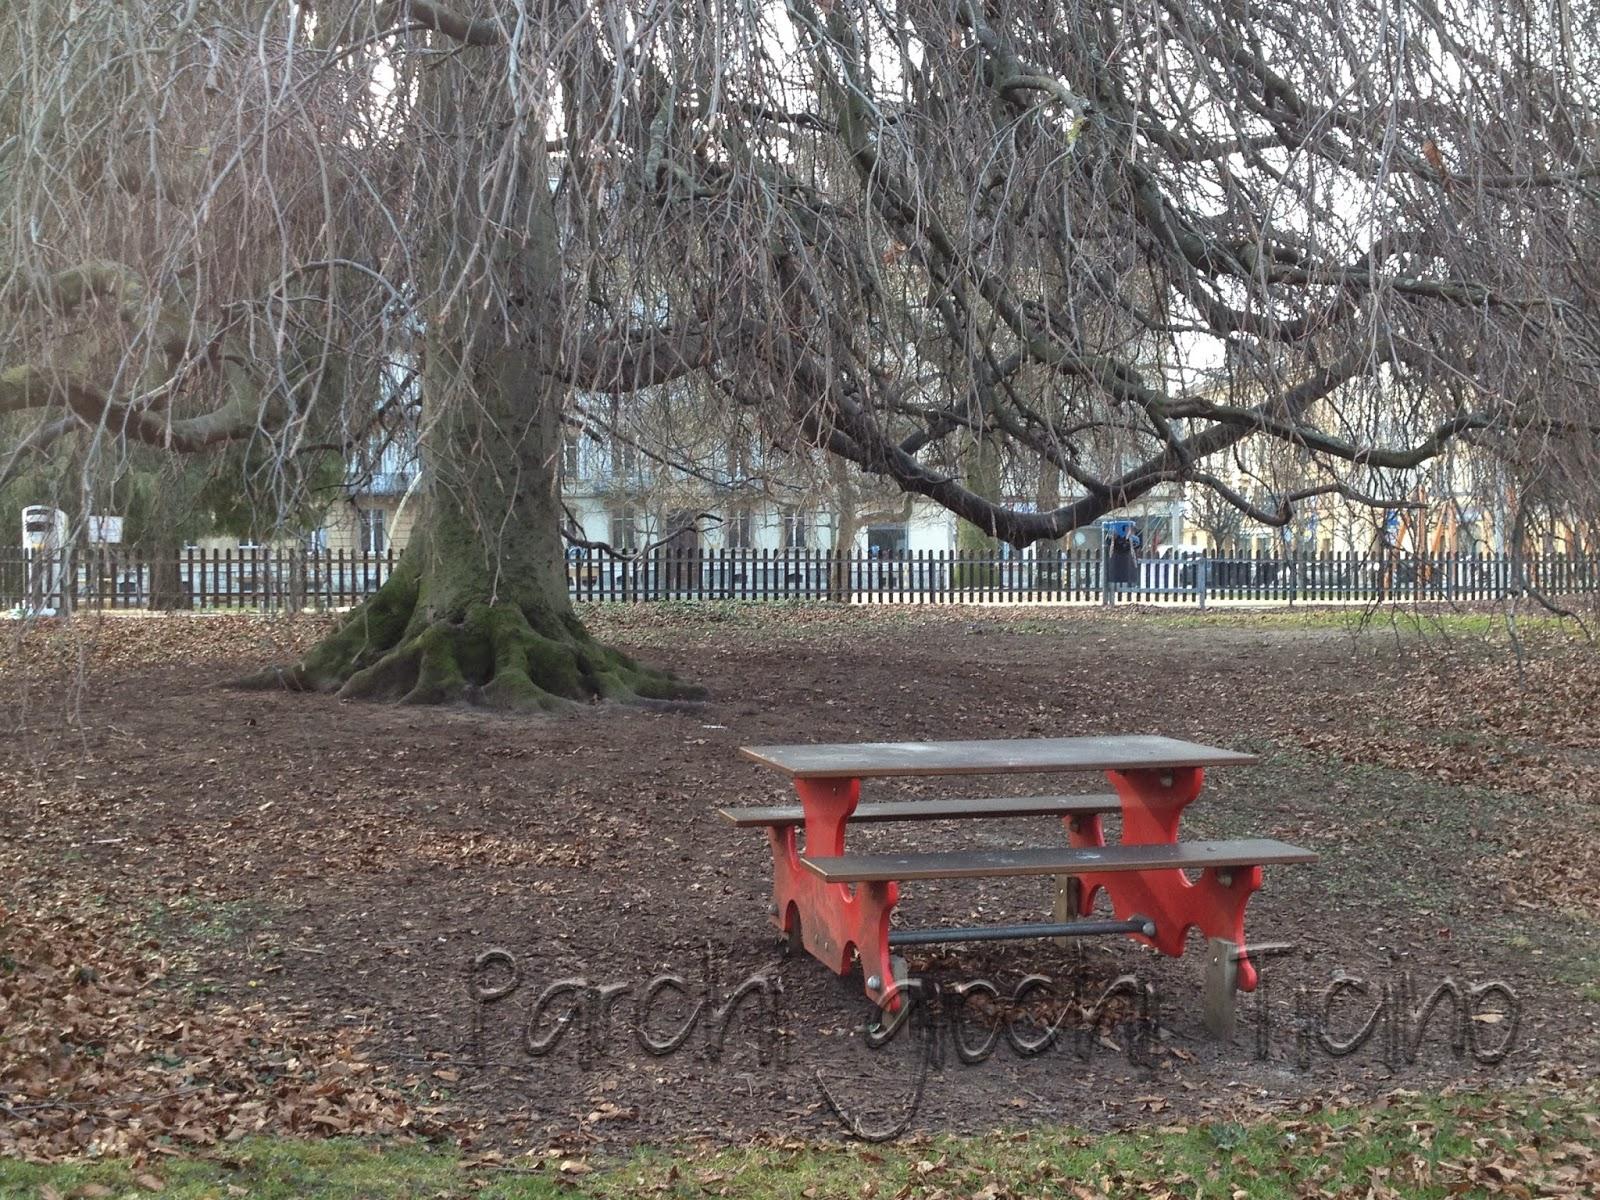 Parco giochi jardin anglais neuch tel parchi giochi ticino for Jardin anglais neuchatel